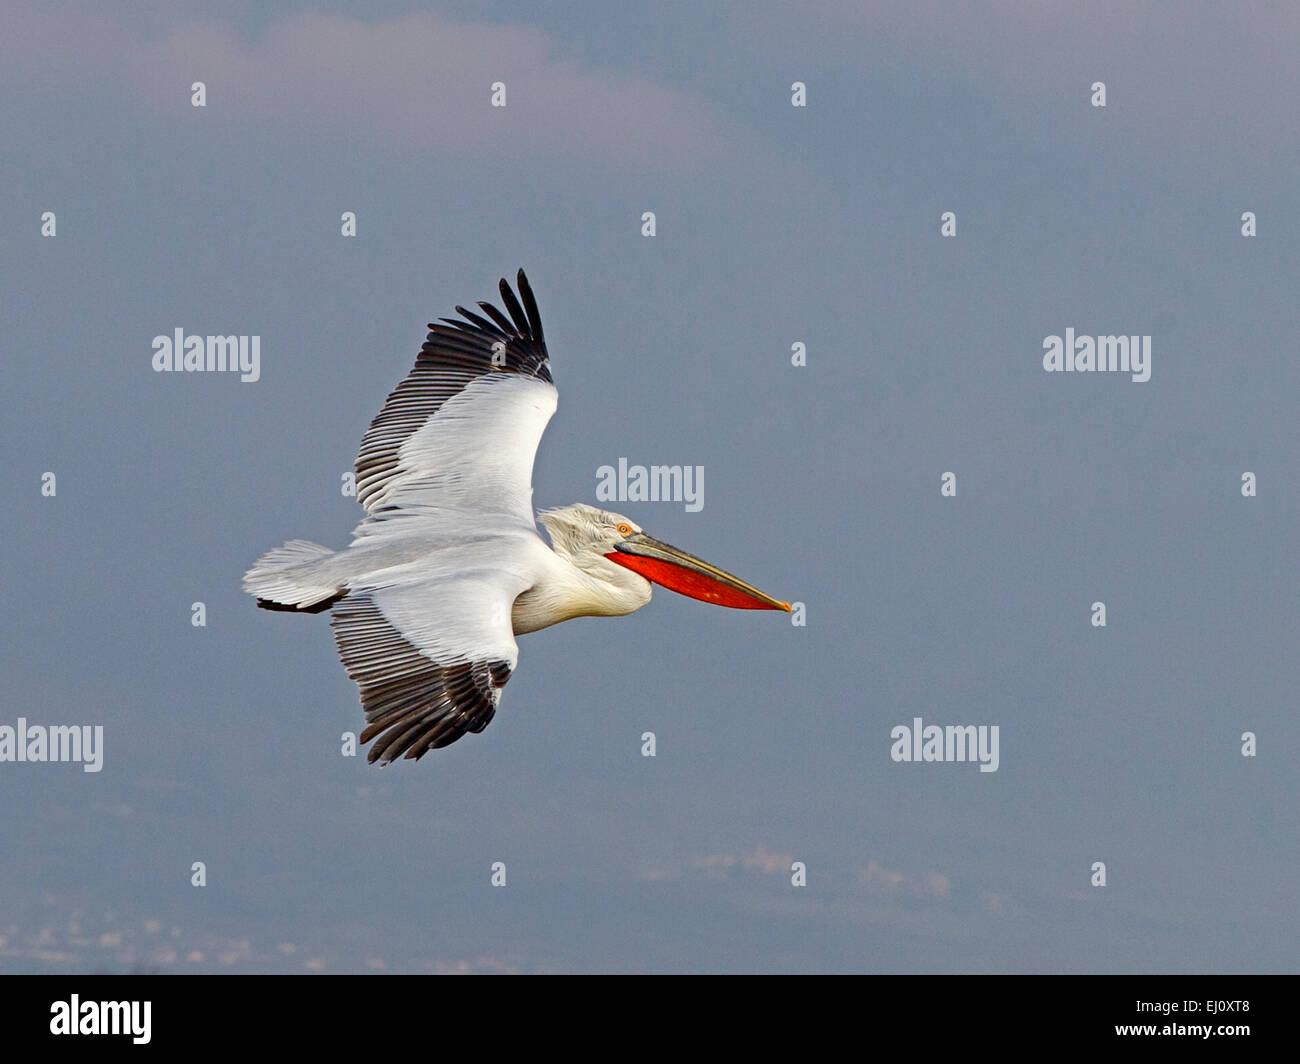 Dalmatian pelican in flight - Stock Image